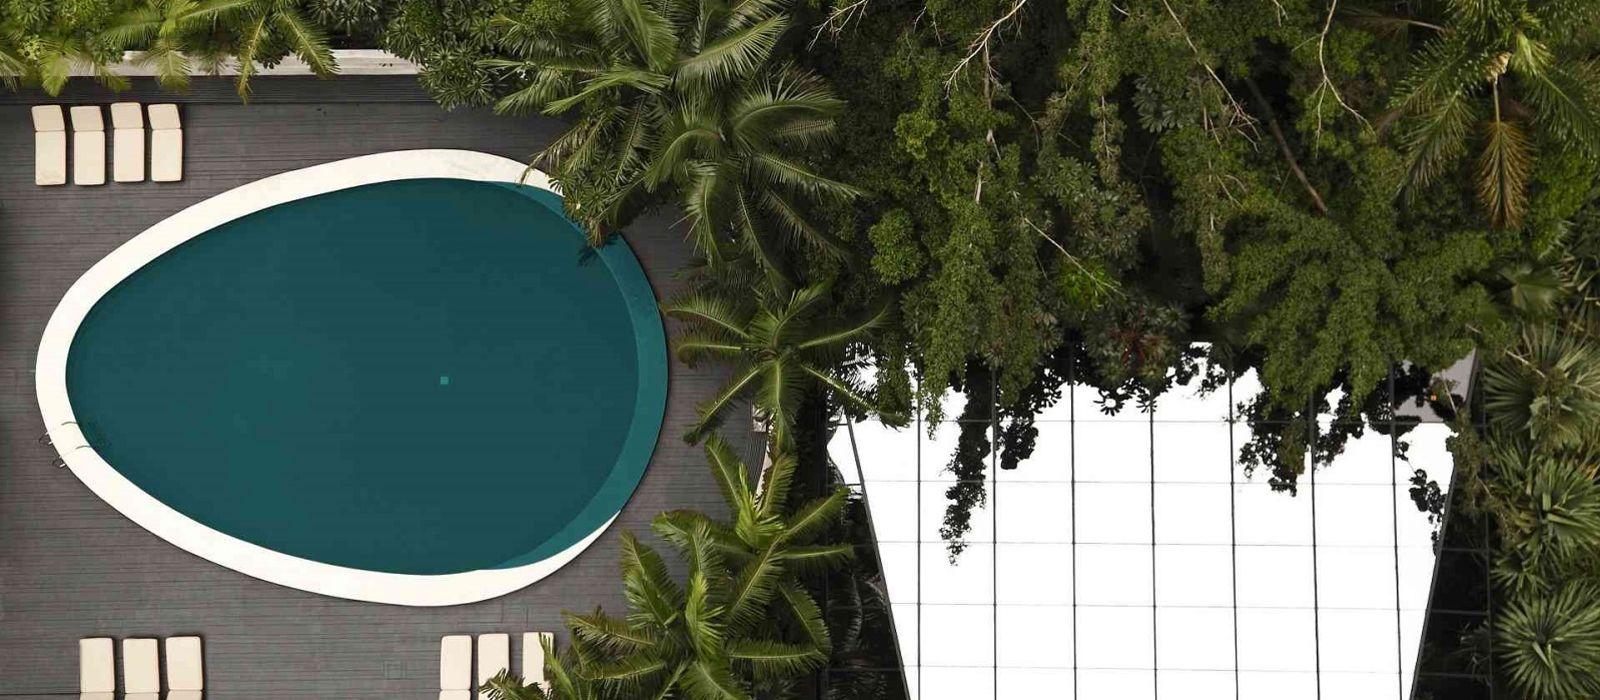 Hotel Tivoli Sao Paulo Mofarrej Brazil